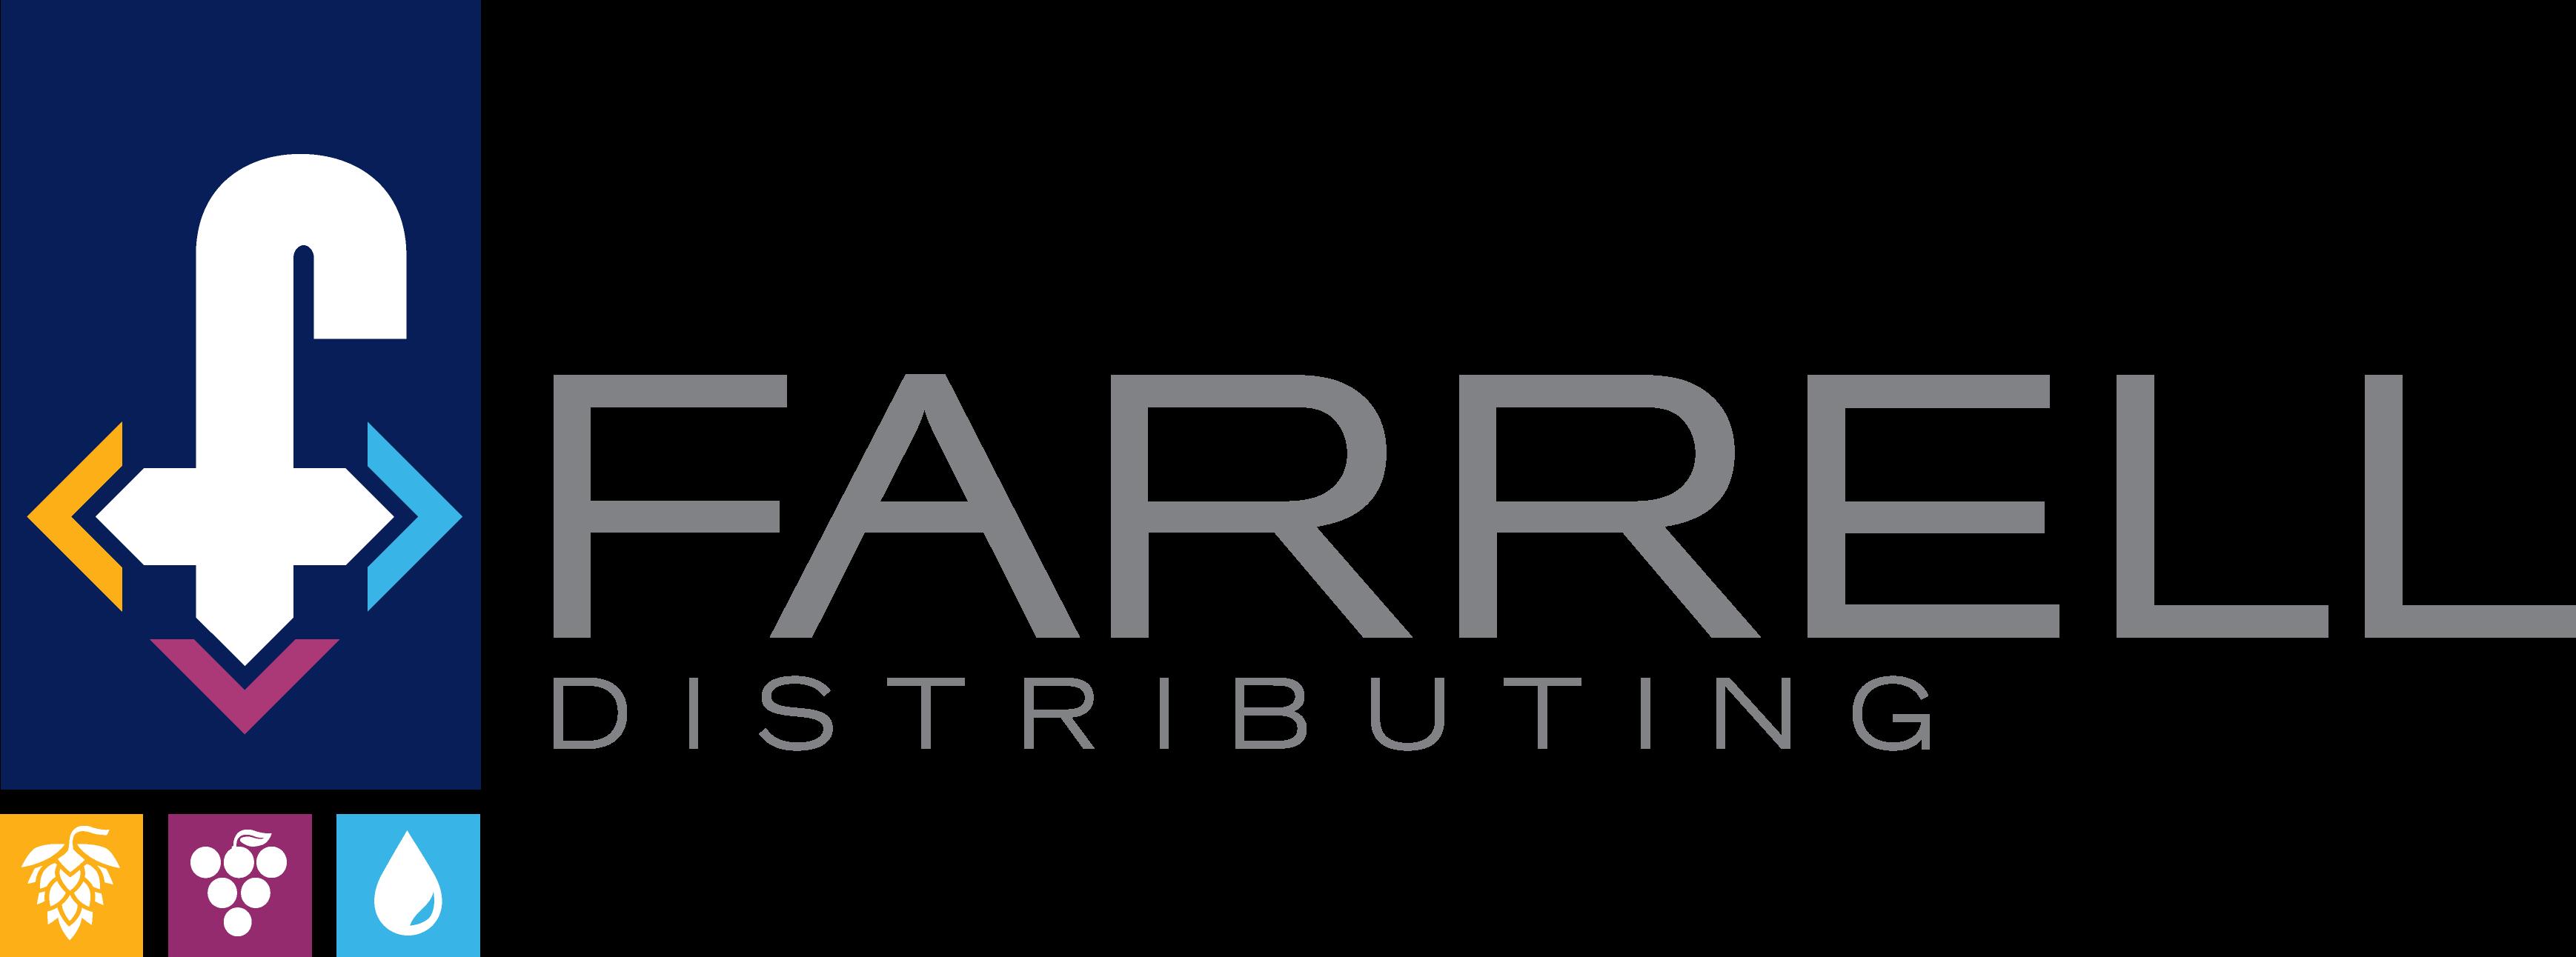 Farrell Distributing Logo